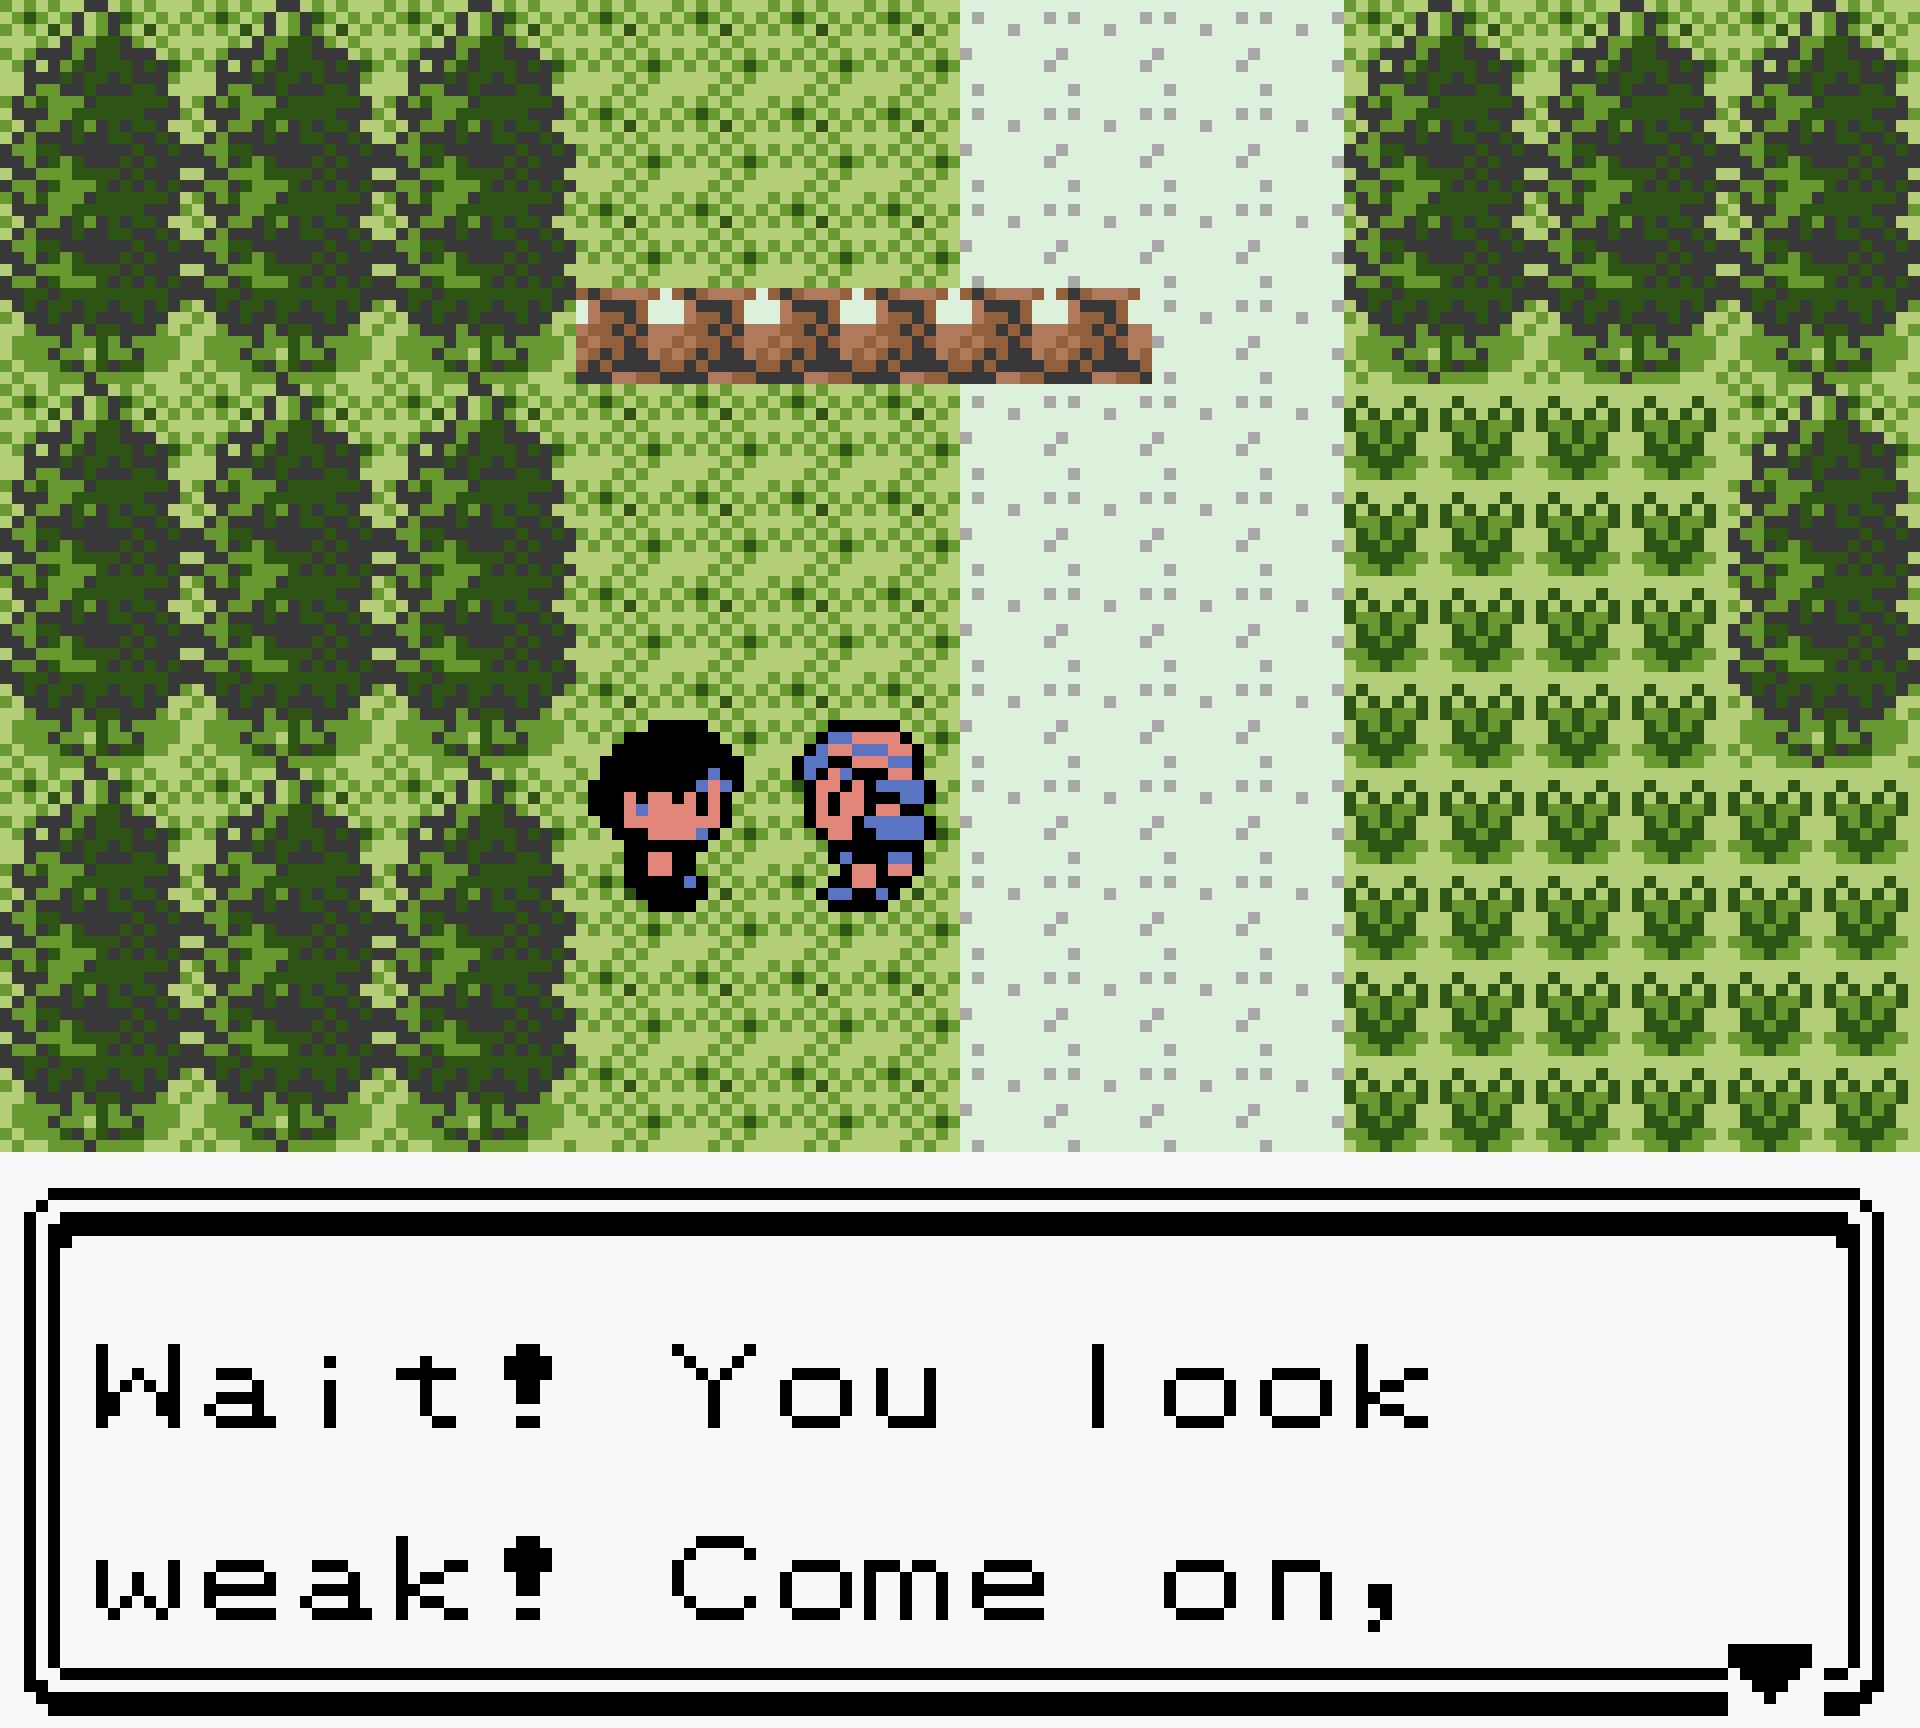 Pokemon_Crystal_Nuzlocke_2021-10-14_16.49.17.png